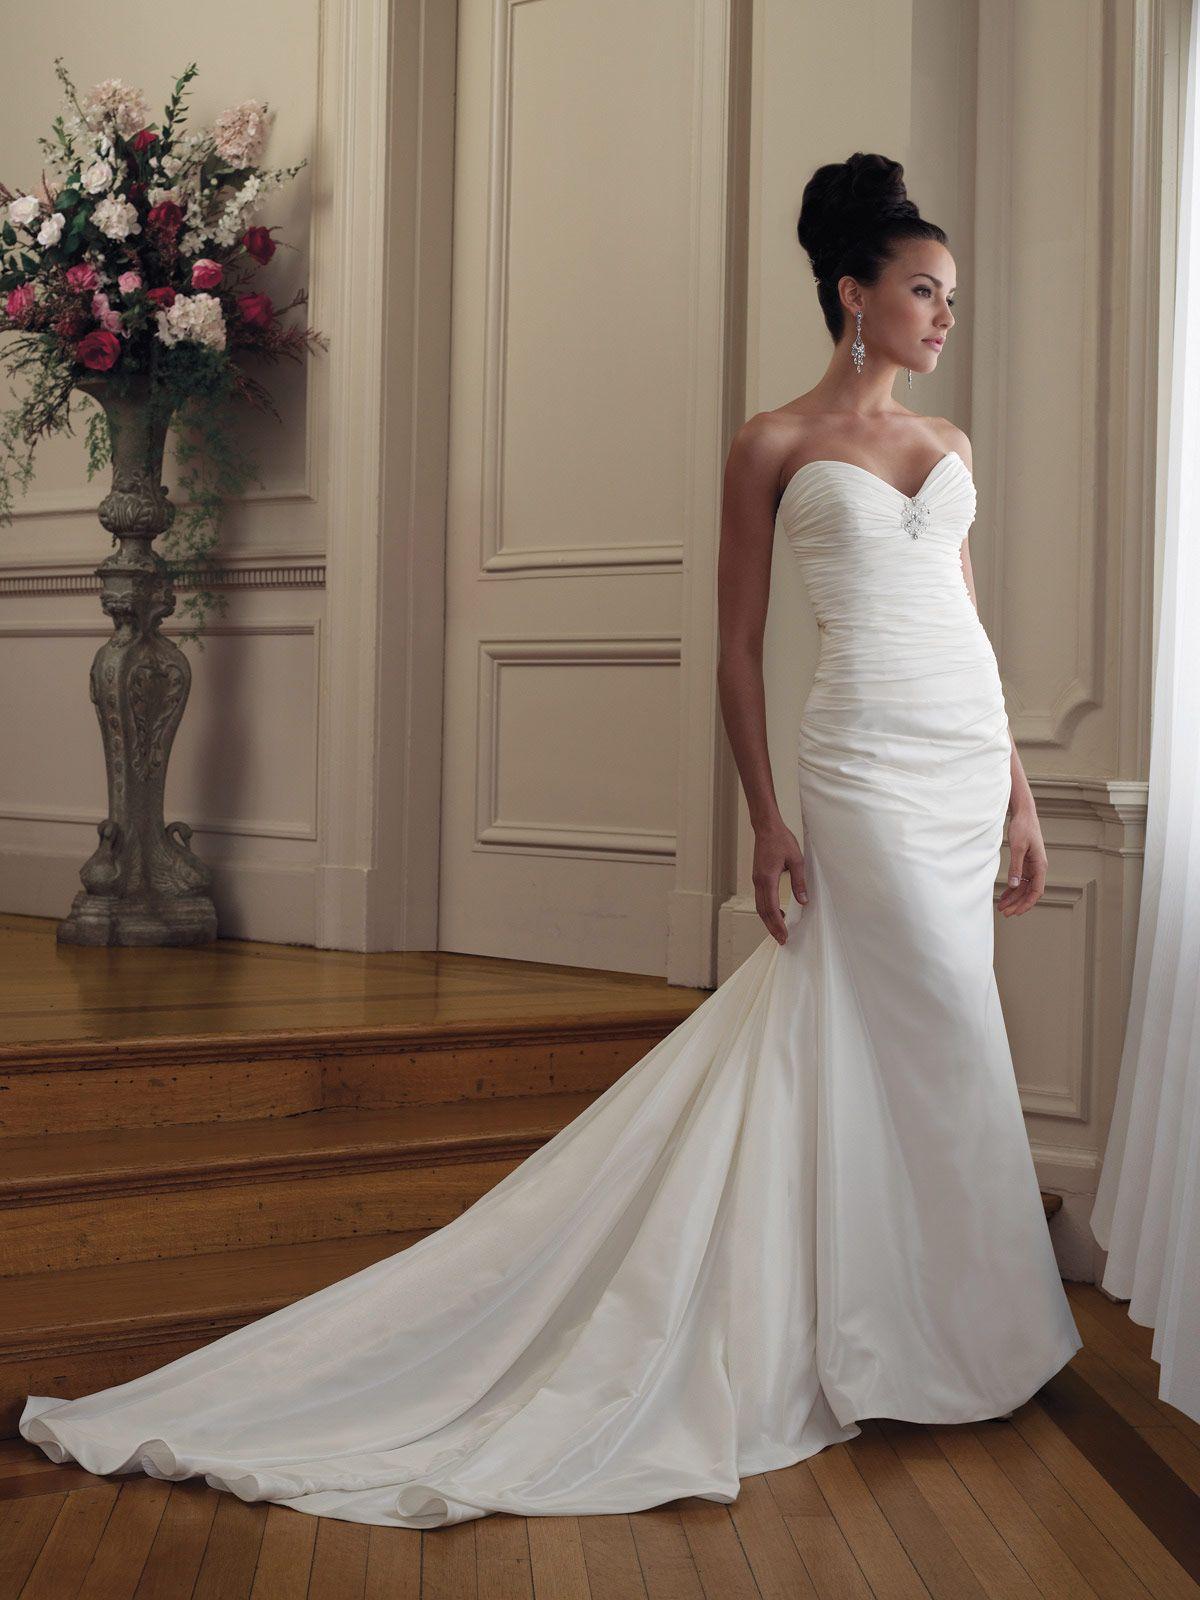 Plus size jacket dress for wedding  Beautiful David tutera dress  Forever a girlfriend  Pinterest